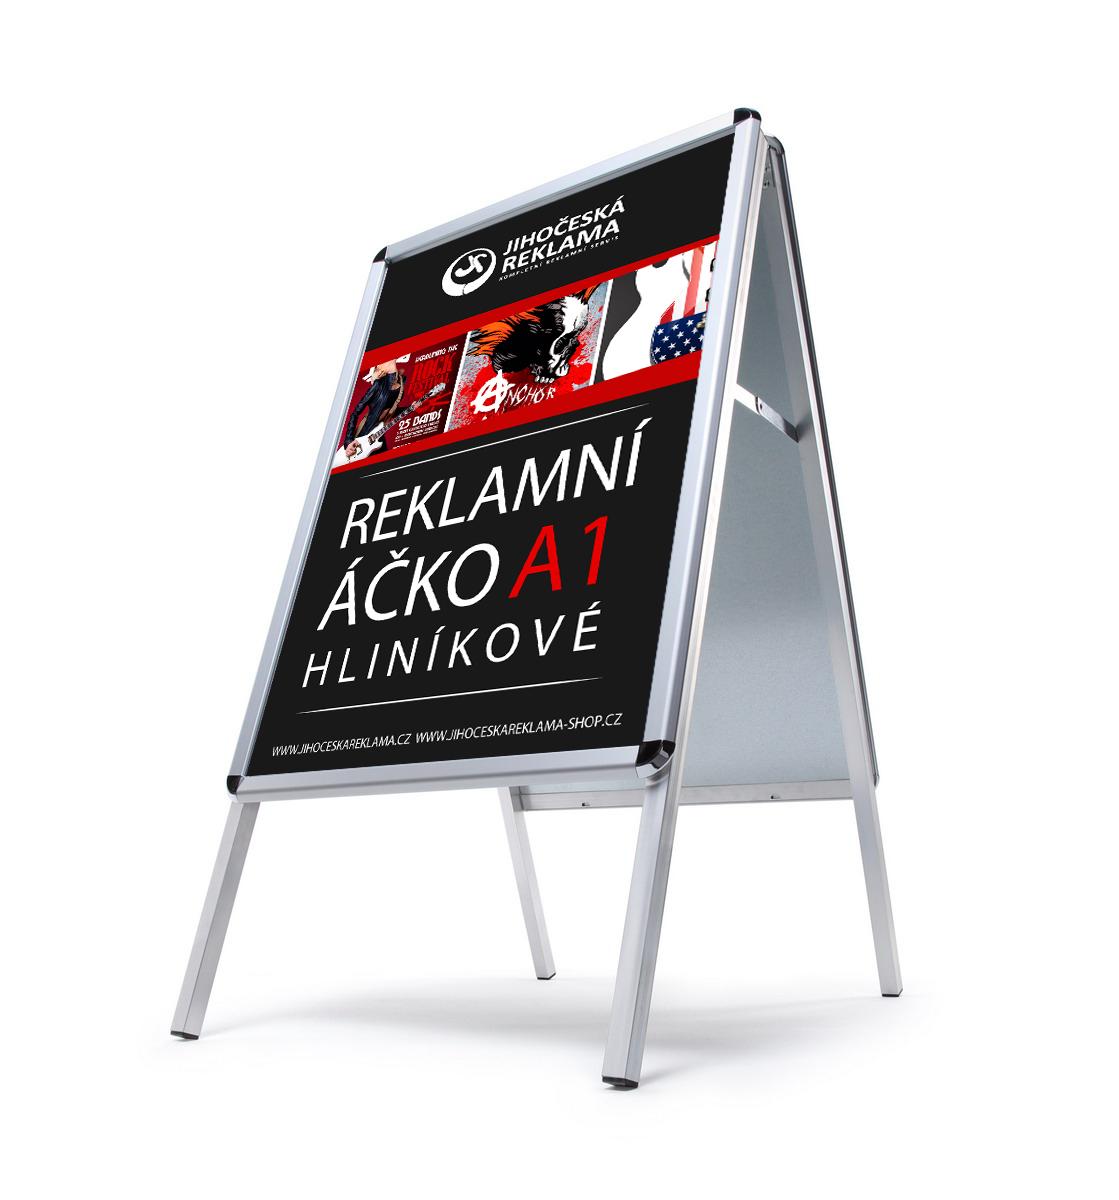 Jihočeská reklama Reklamí stojan - áčko A1